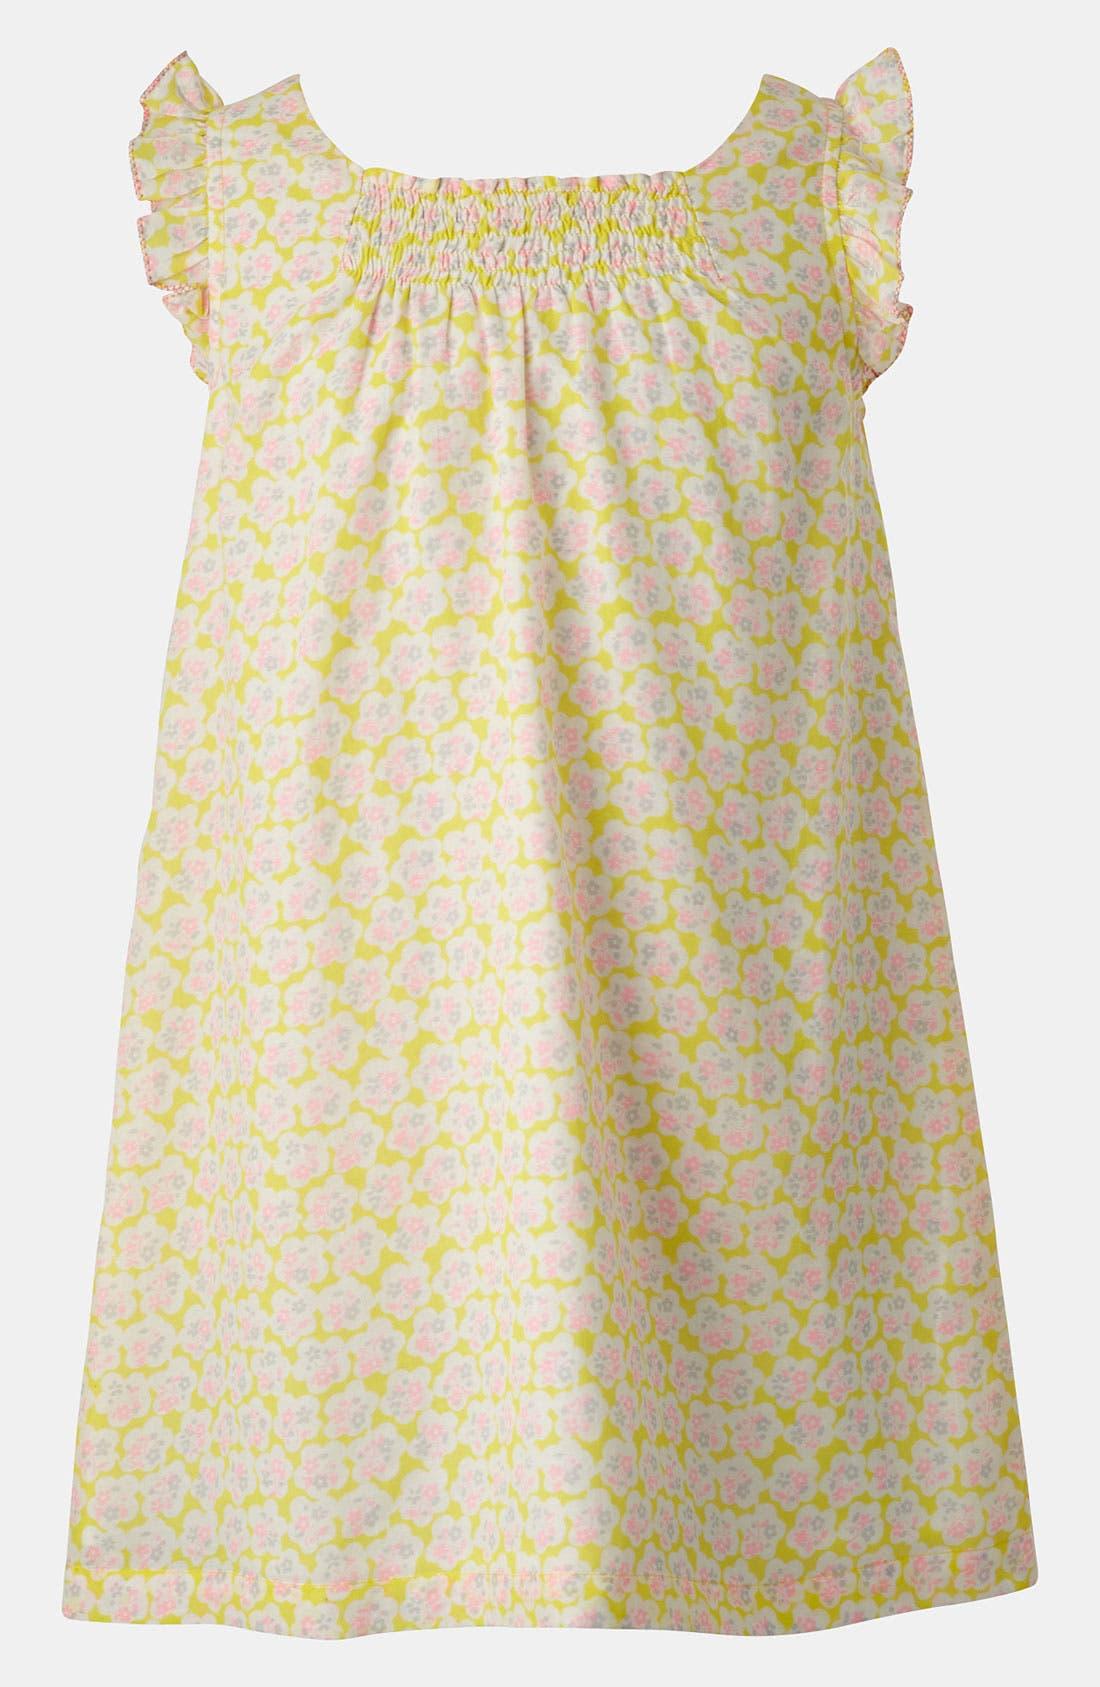 Main Image - Mini Boden 'Angel' Dress (Toddler, Little Girls & Big Girls)